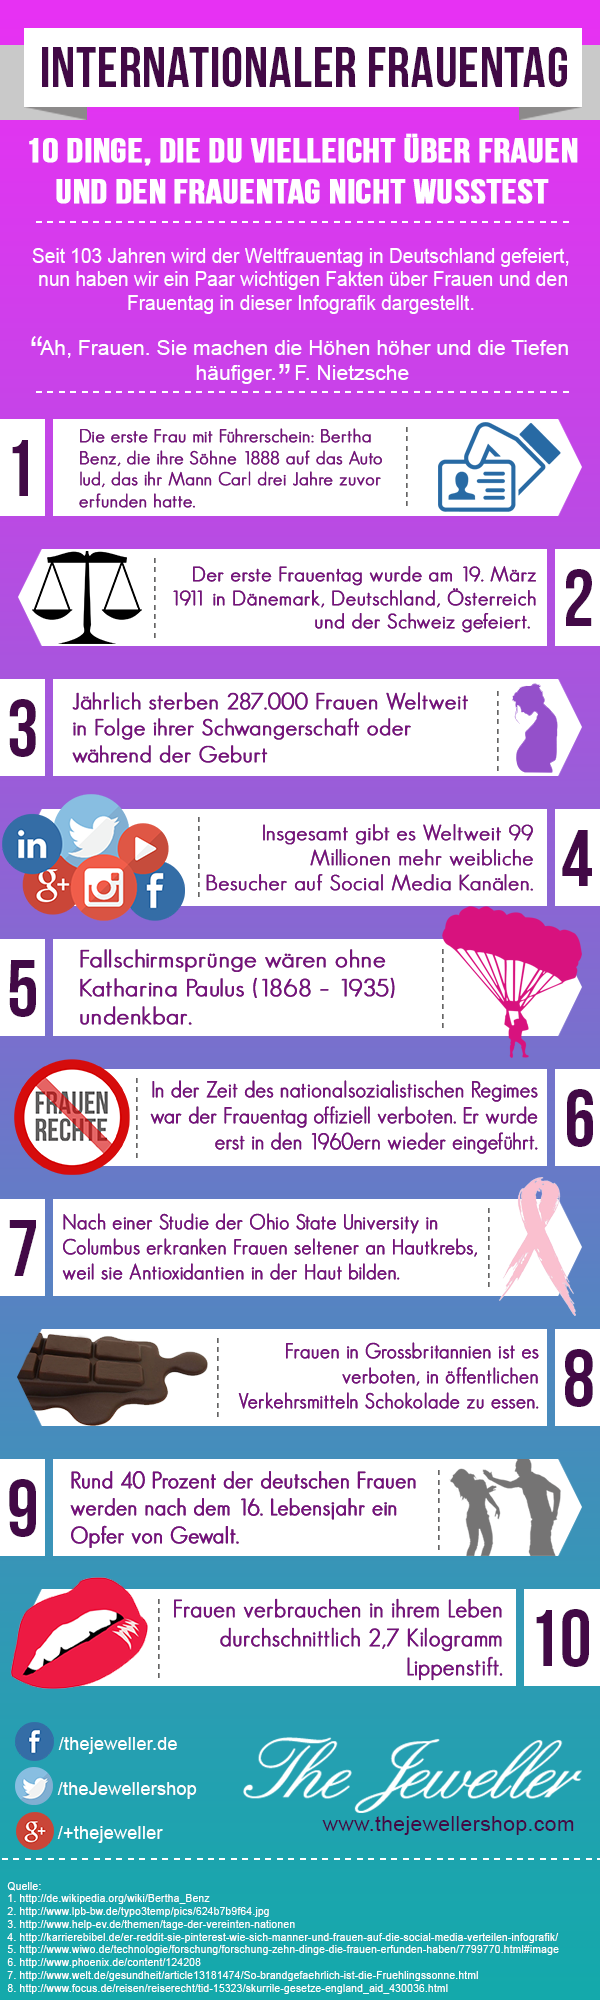 Frauentag Infograik